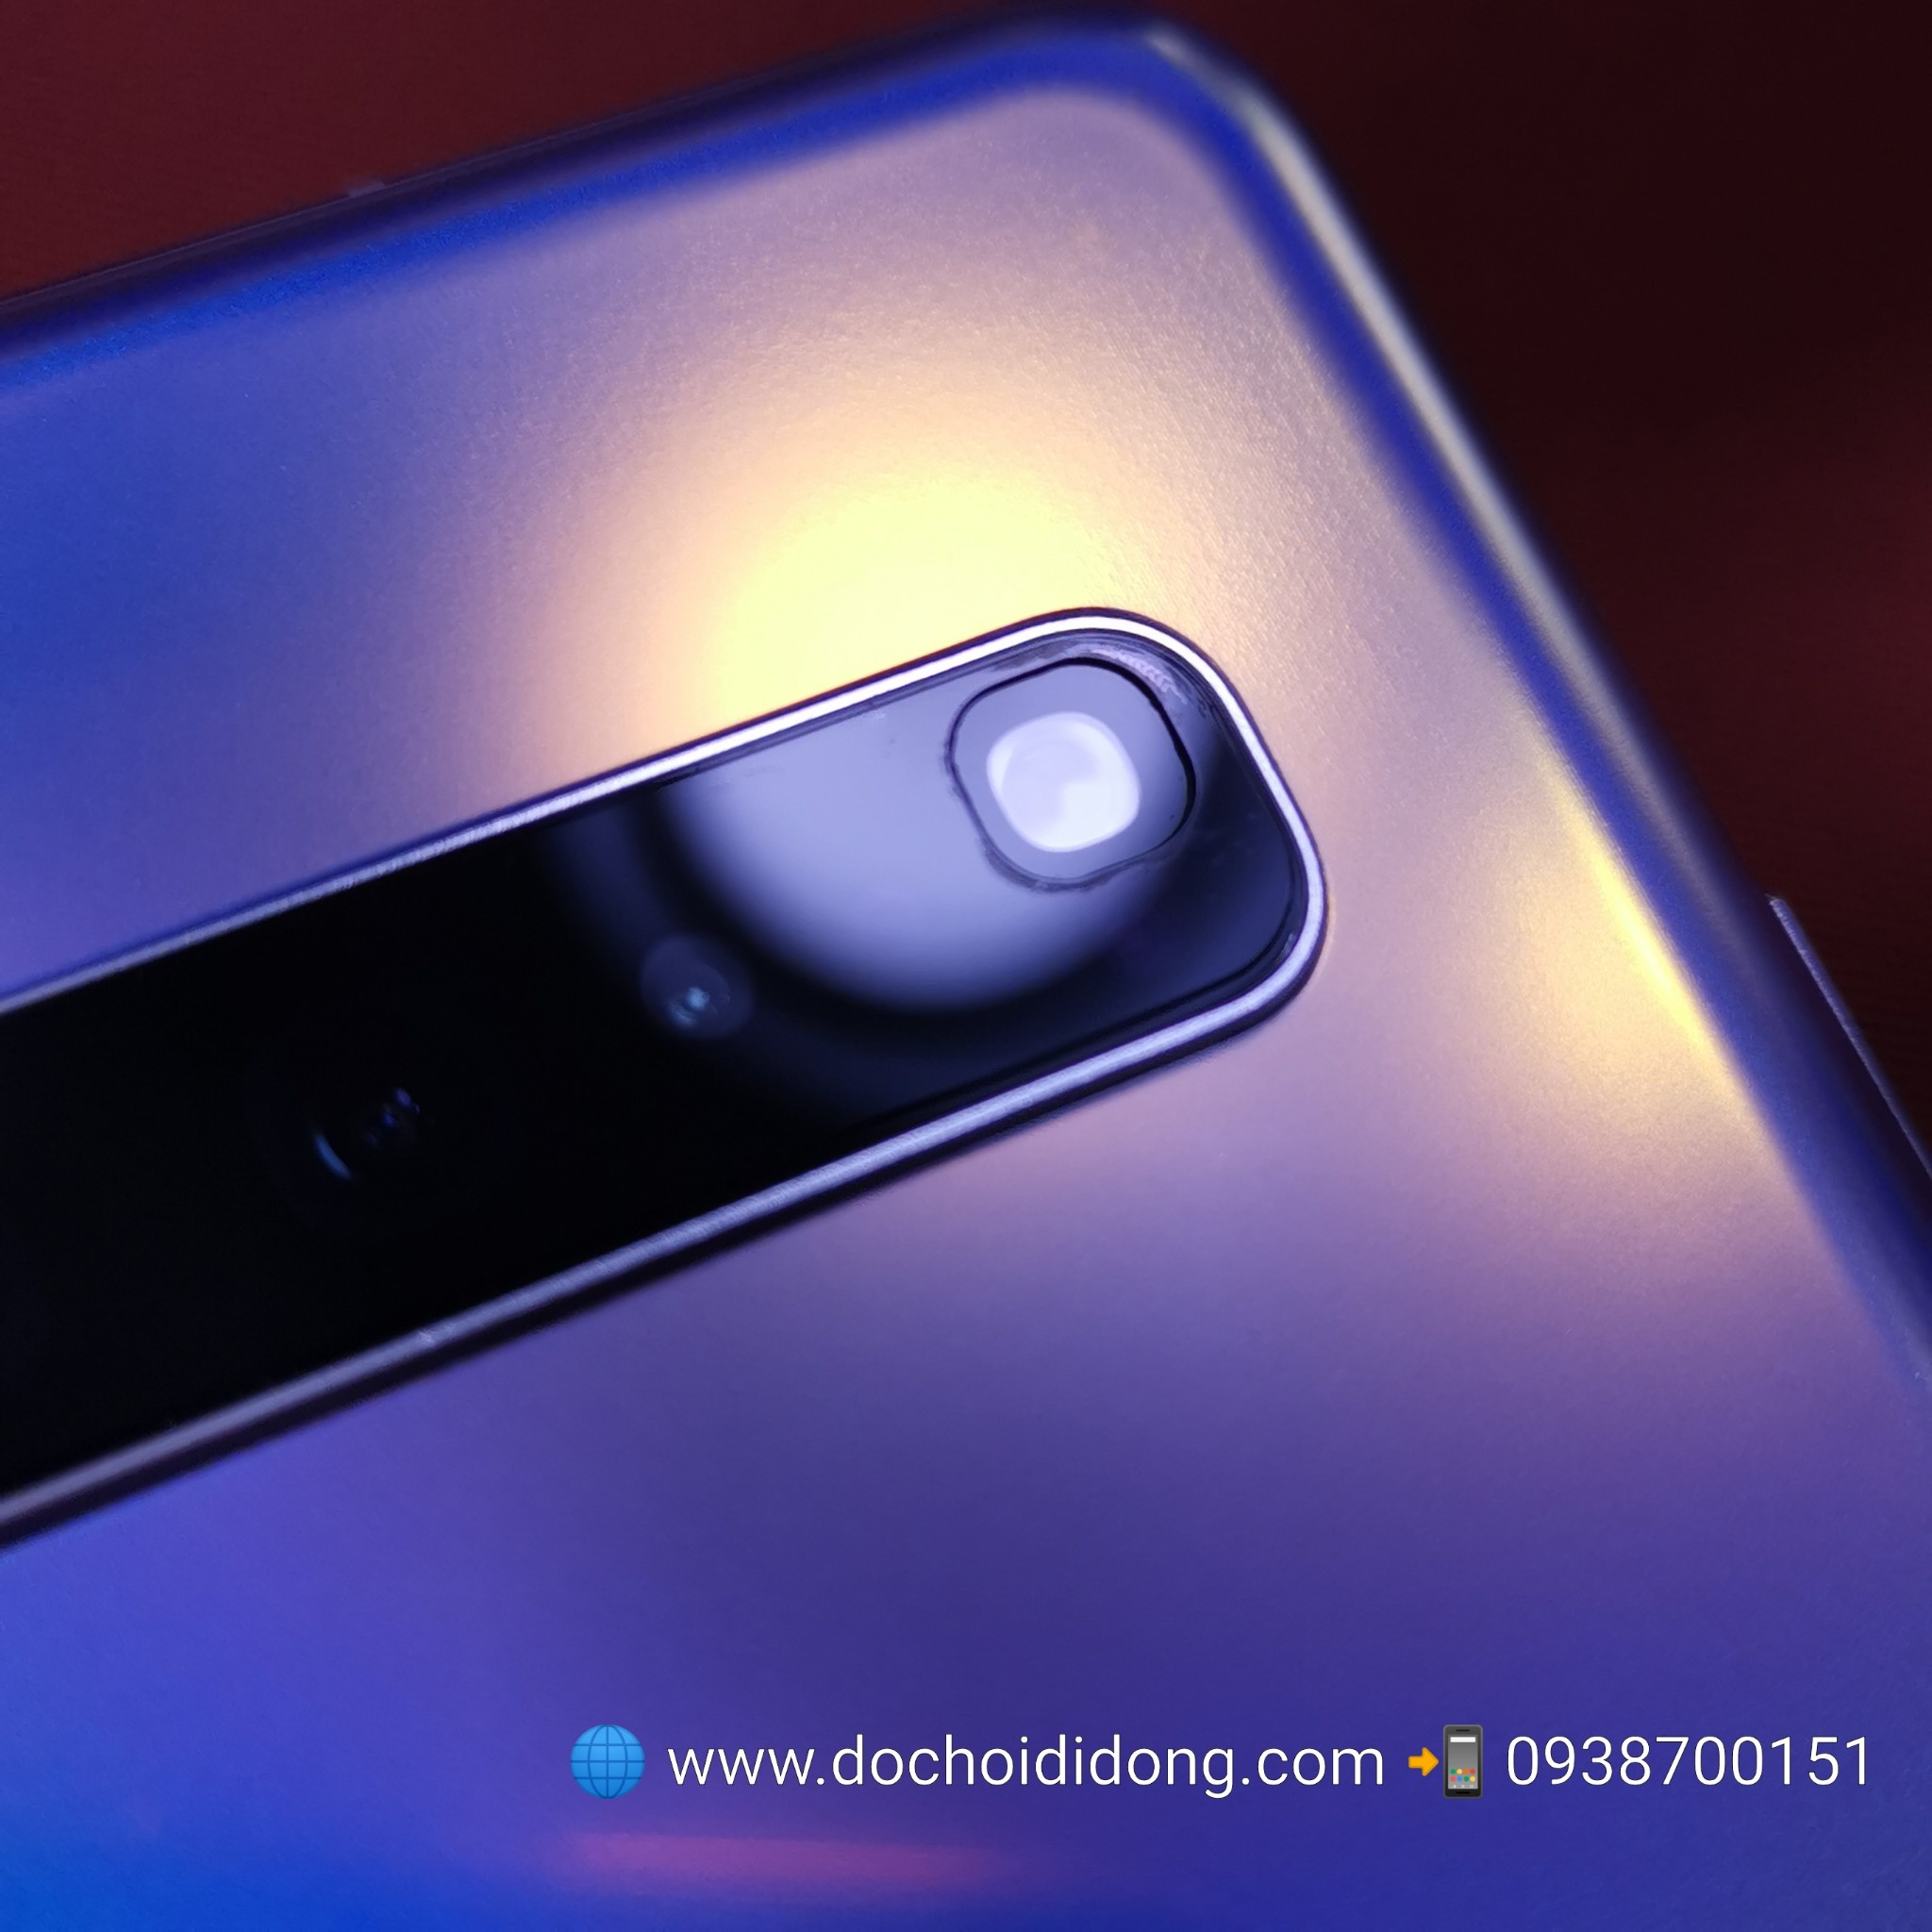 Miếng dán cường lực camera Samsung S10 5G 9H